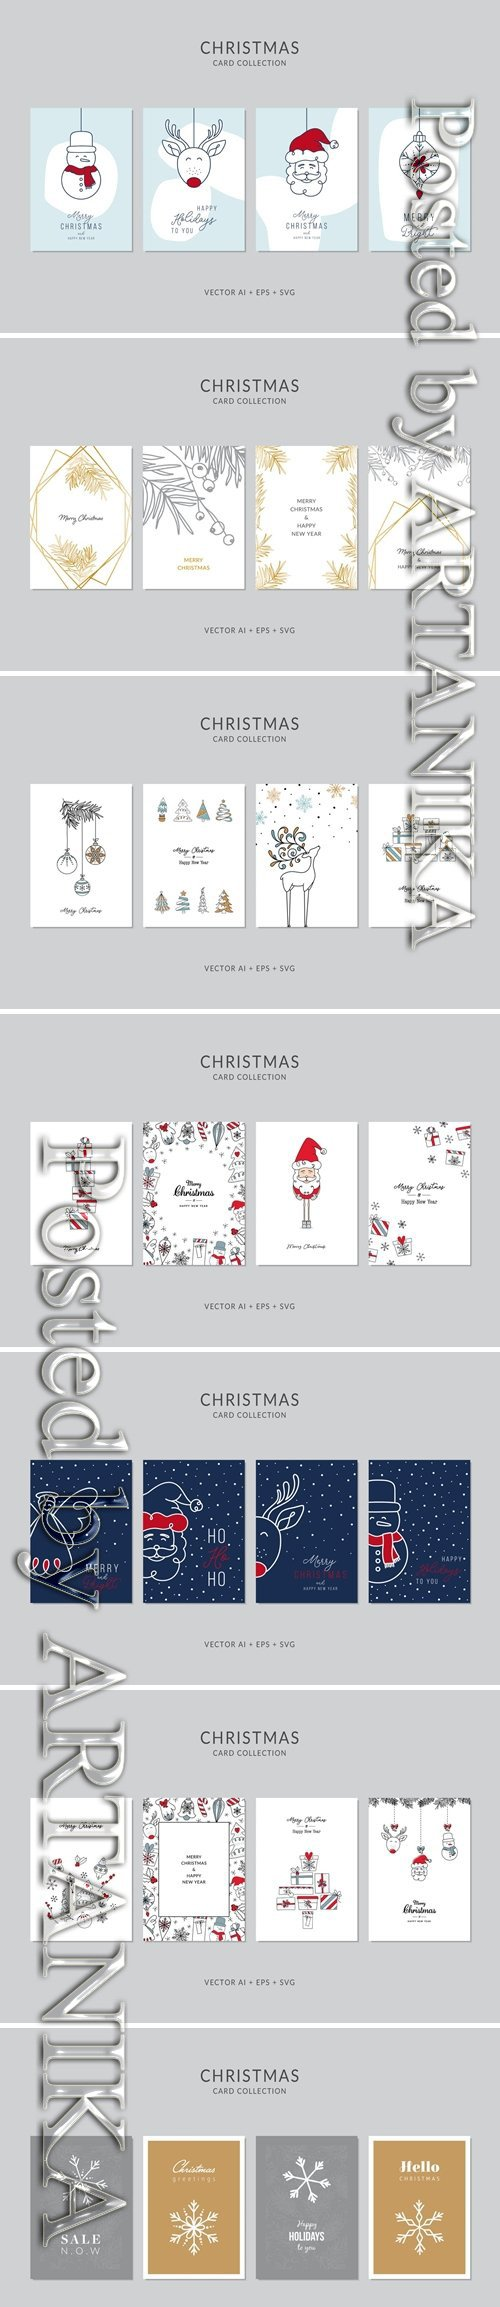 Christmas Greeting Card Vector Set